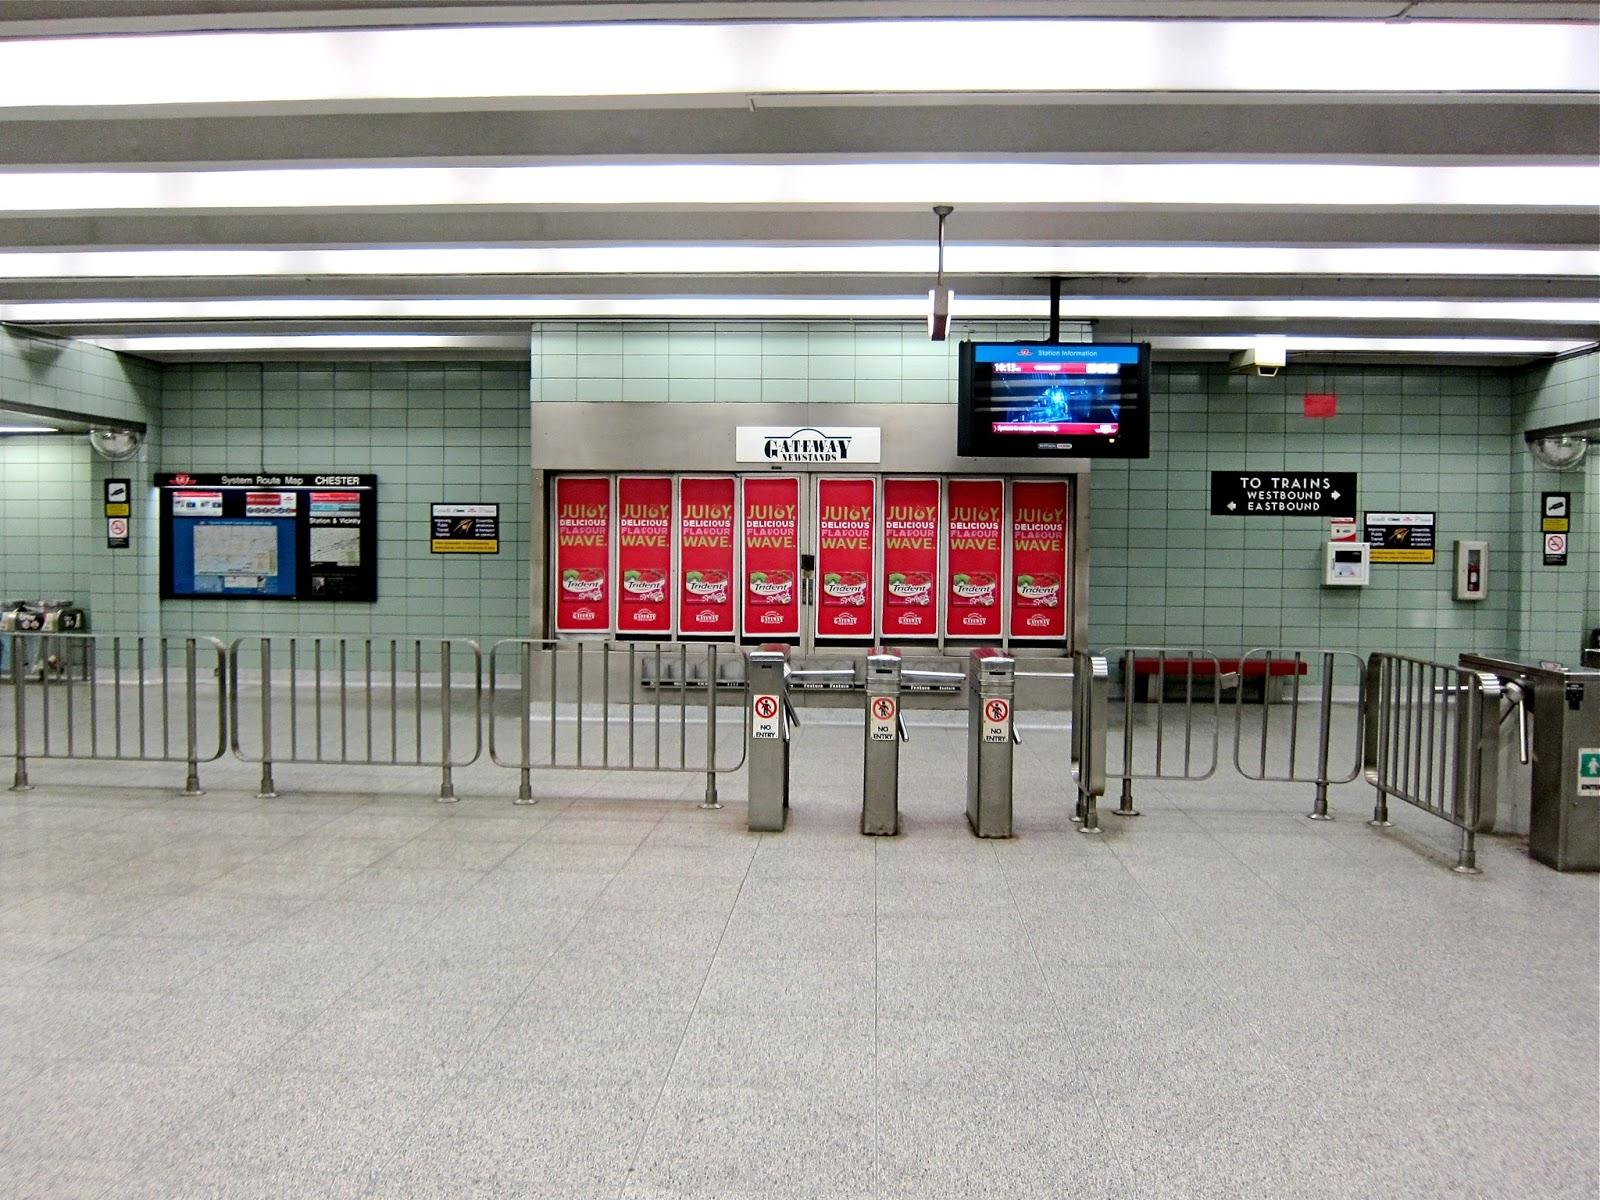 Chester station entrance